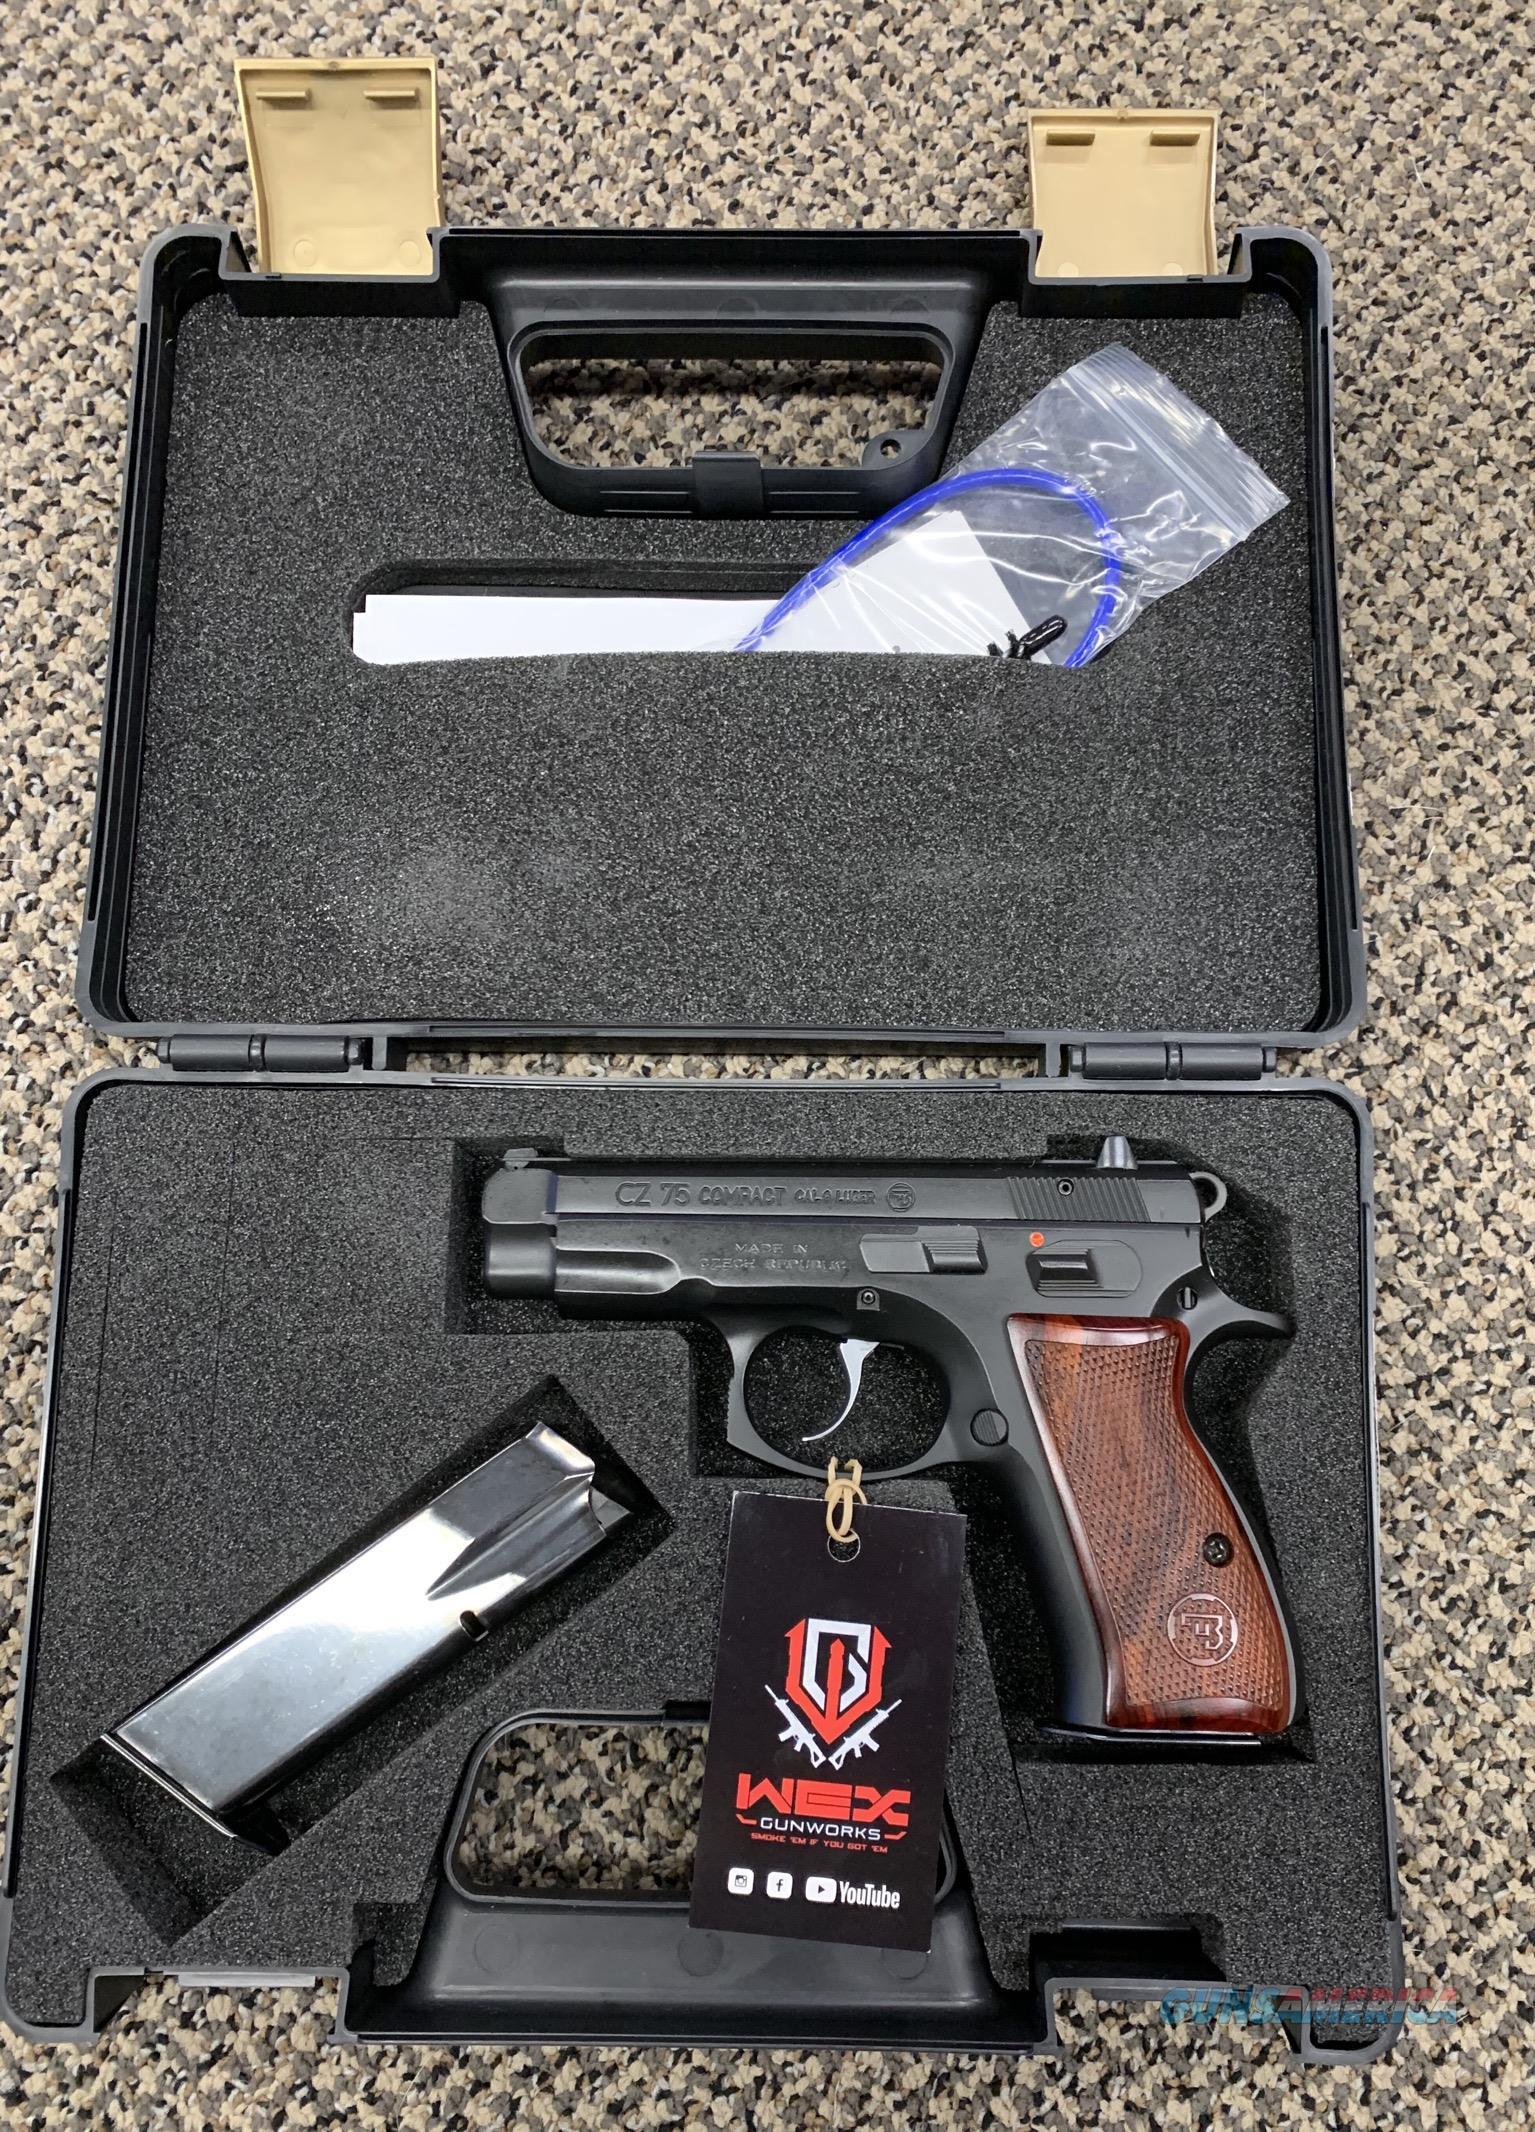 CZ 75 COMPACT 9MM 3 5/8 INCH BBL   Guns > Pistols > CZ Pistols